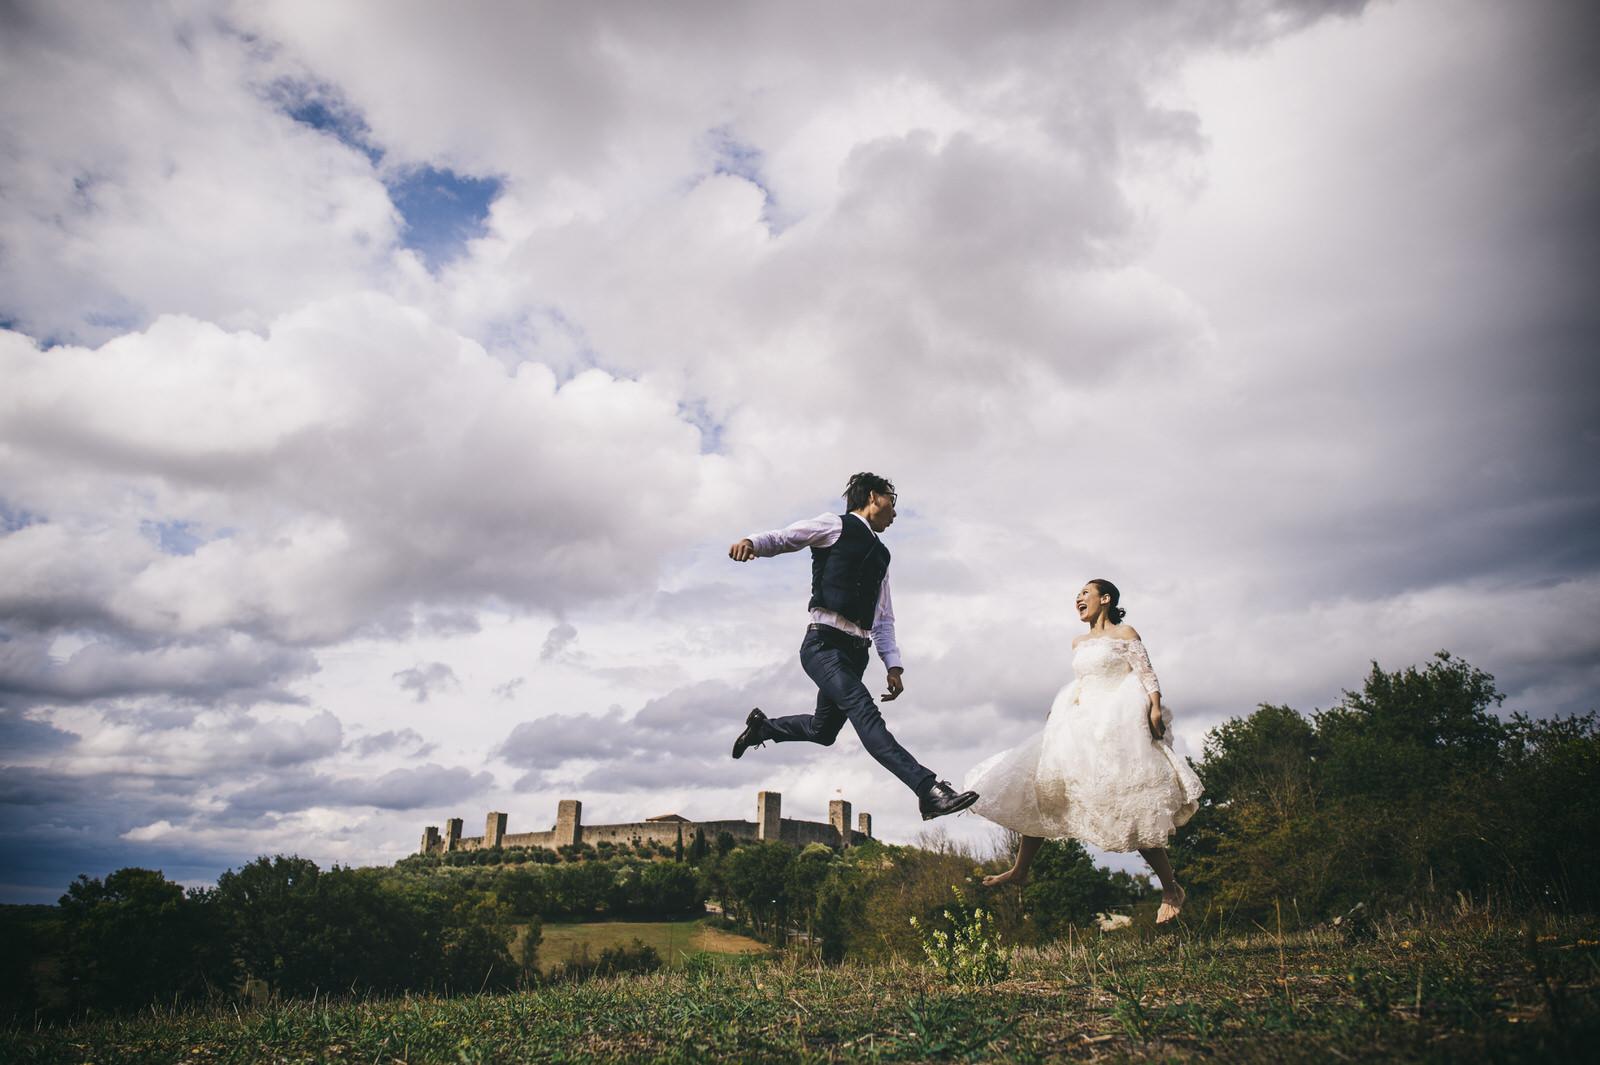 wedding photographer in italy-venice-tuscany-florence-amalfi coast-como lake-villa del balbianello-siena-amalfi-ravello-belmond-villa cimbrone8